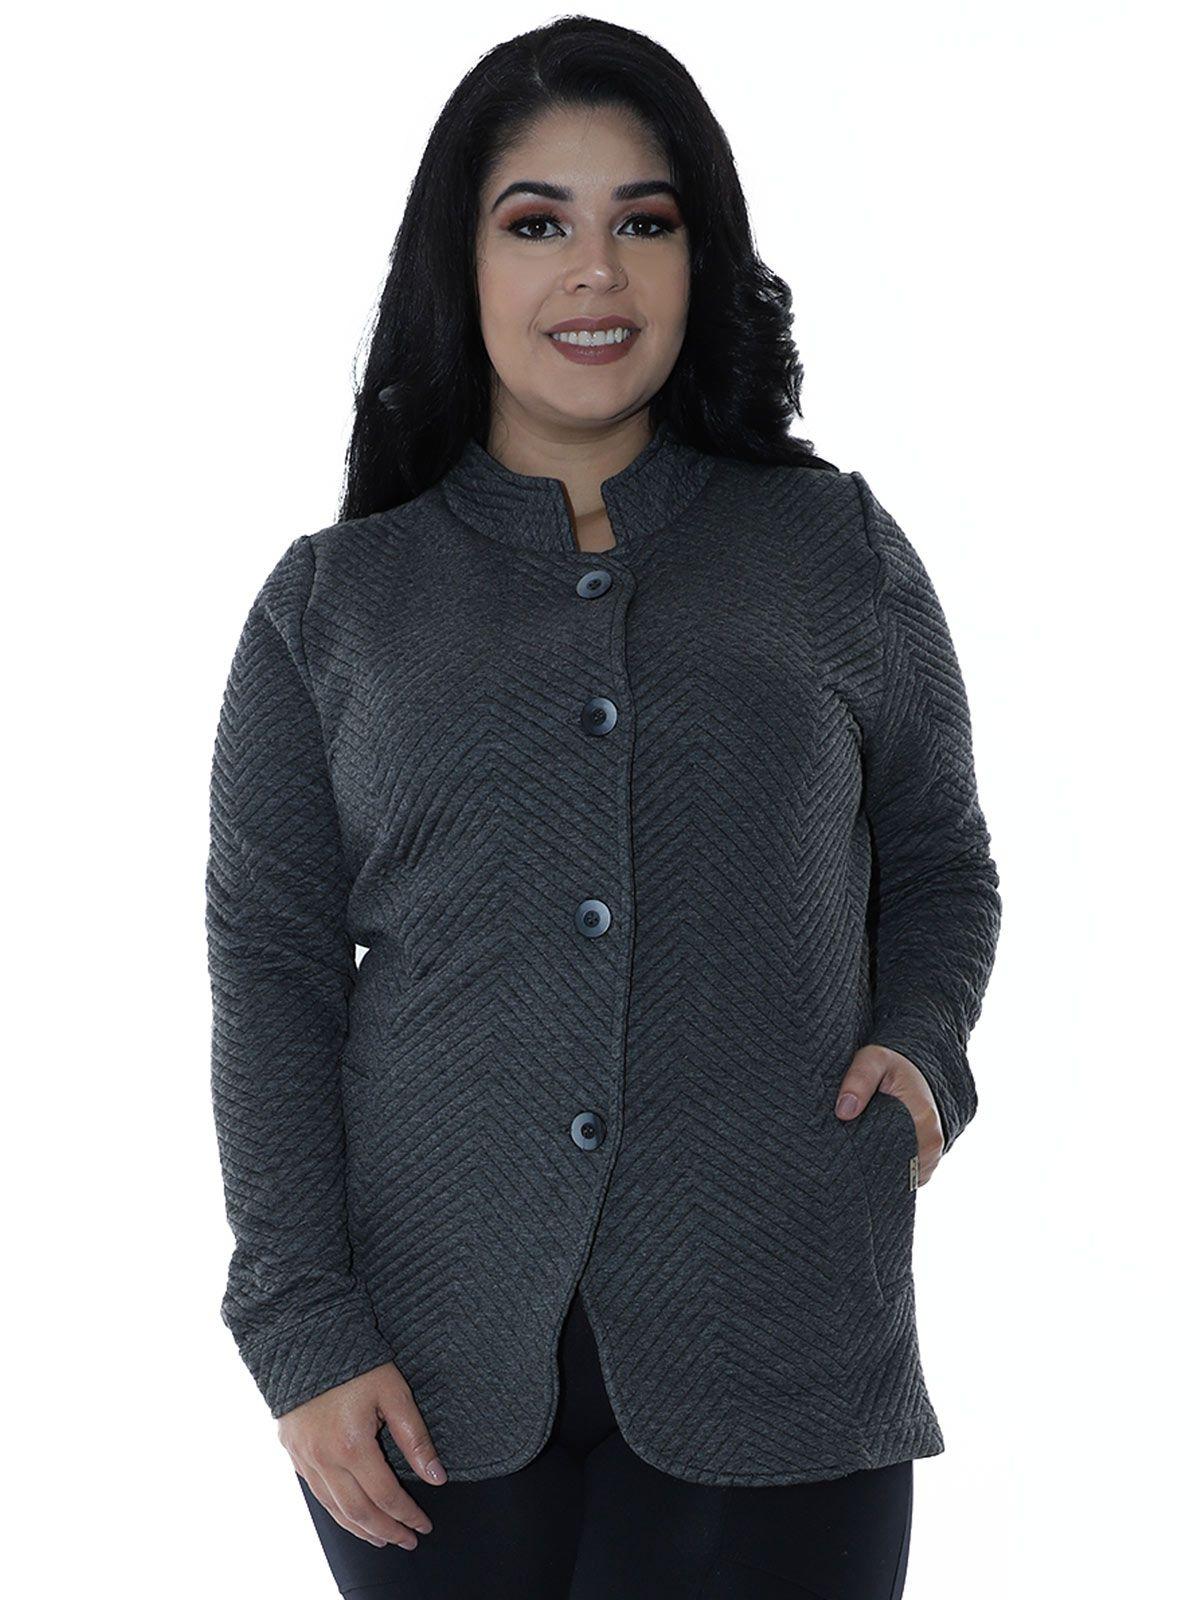 Casaco Plus Size Matelasse com Botões Mescla Escuro